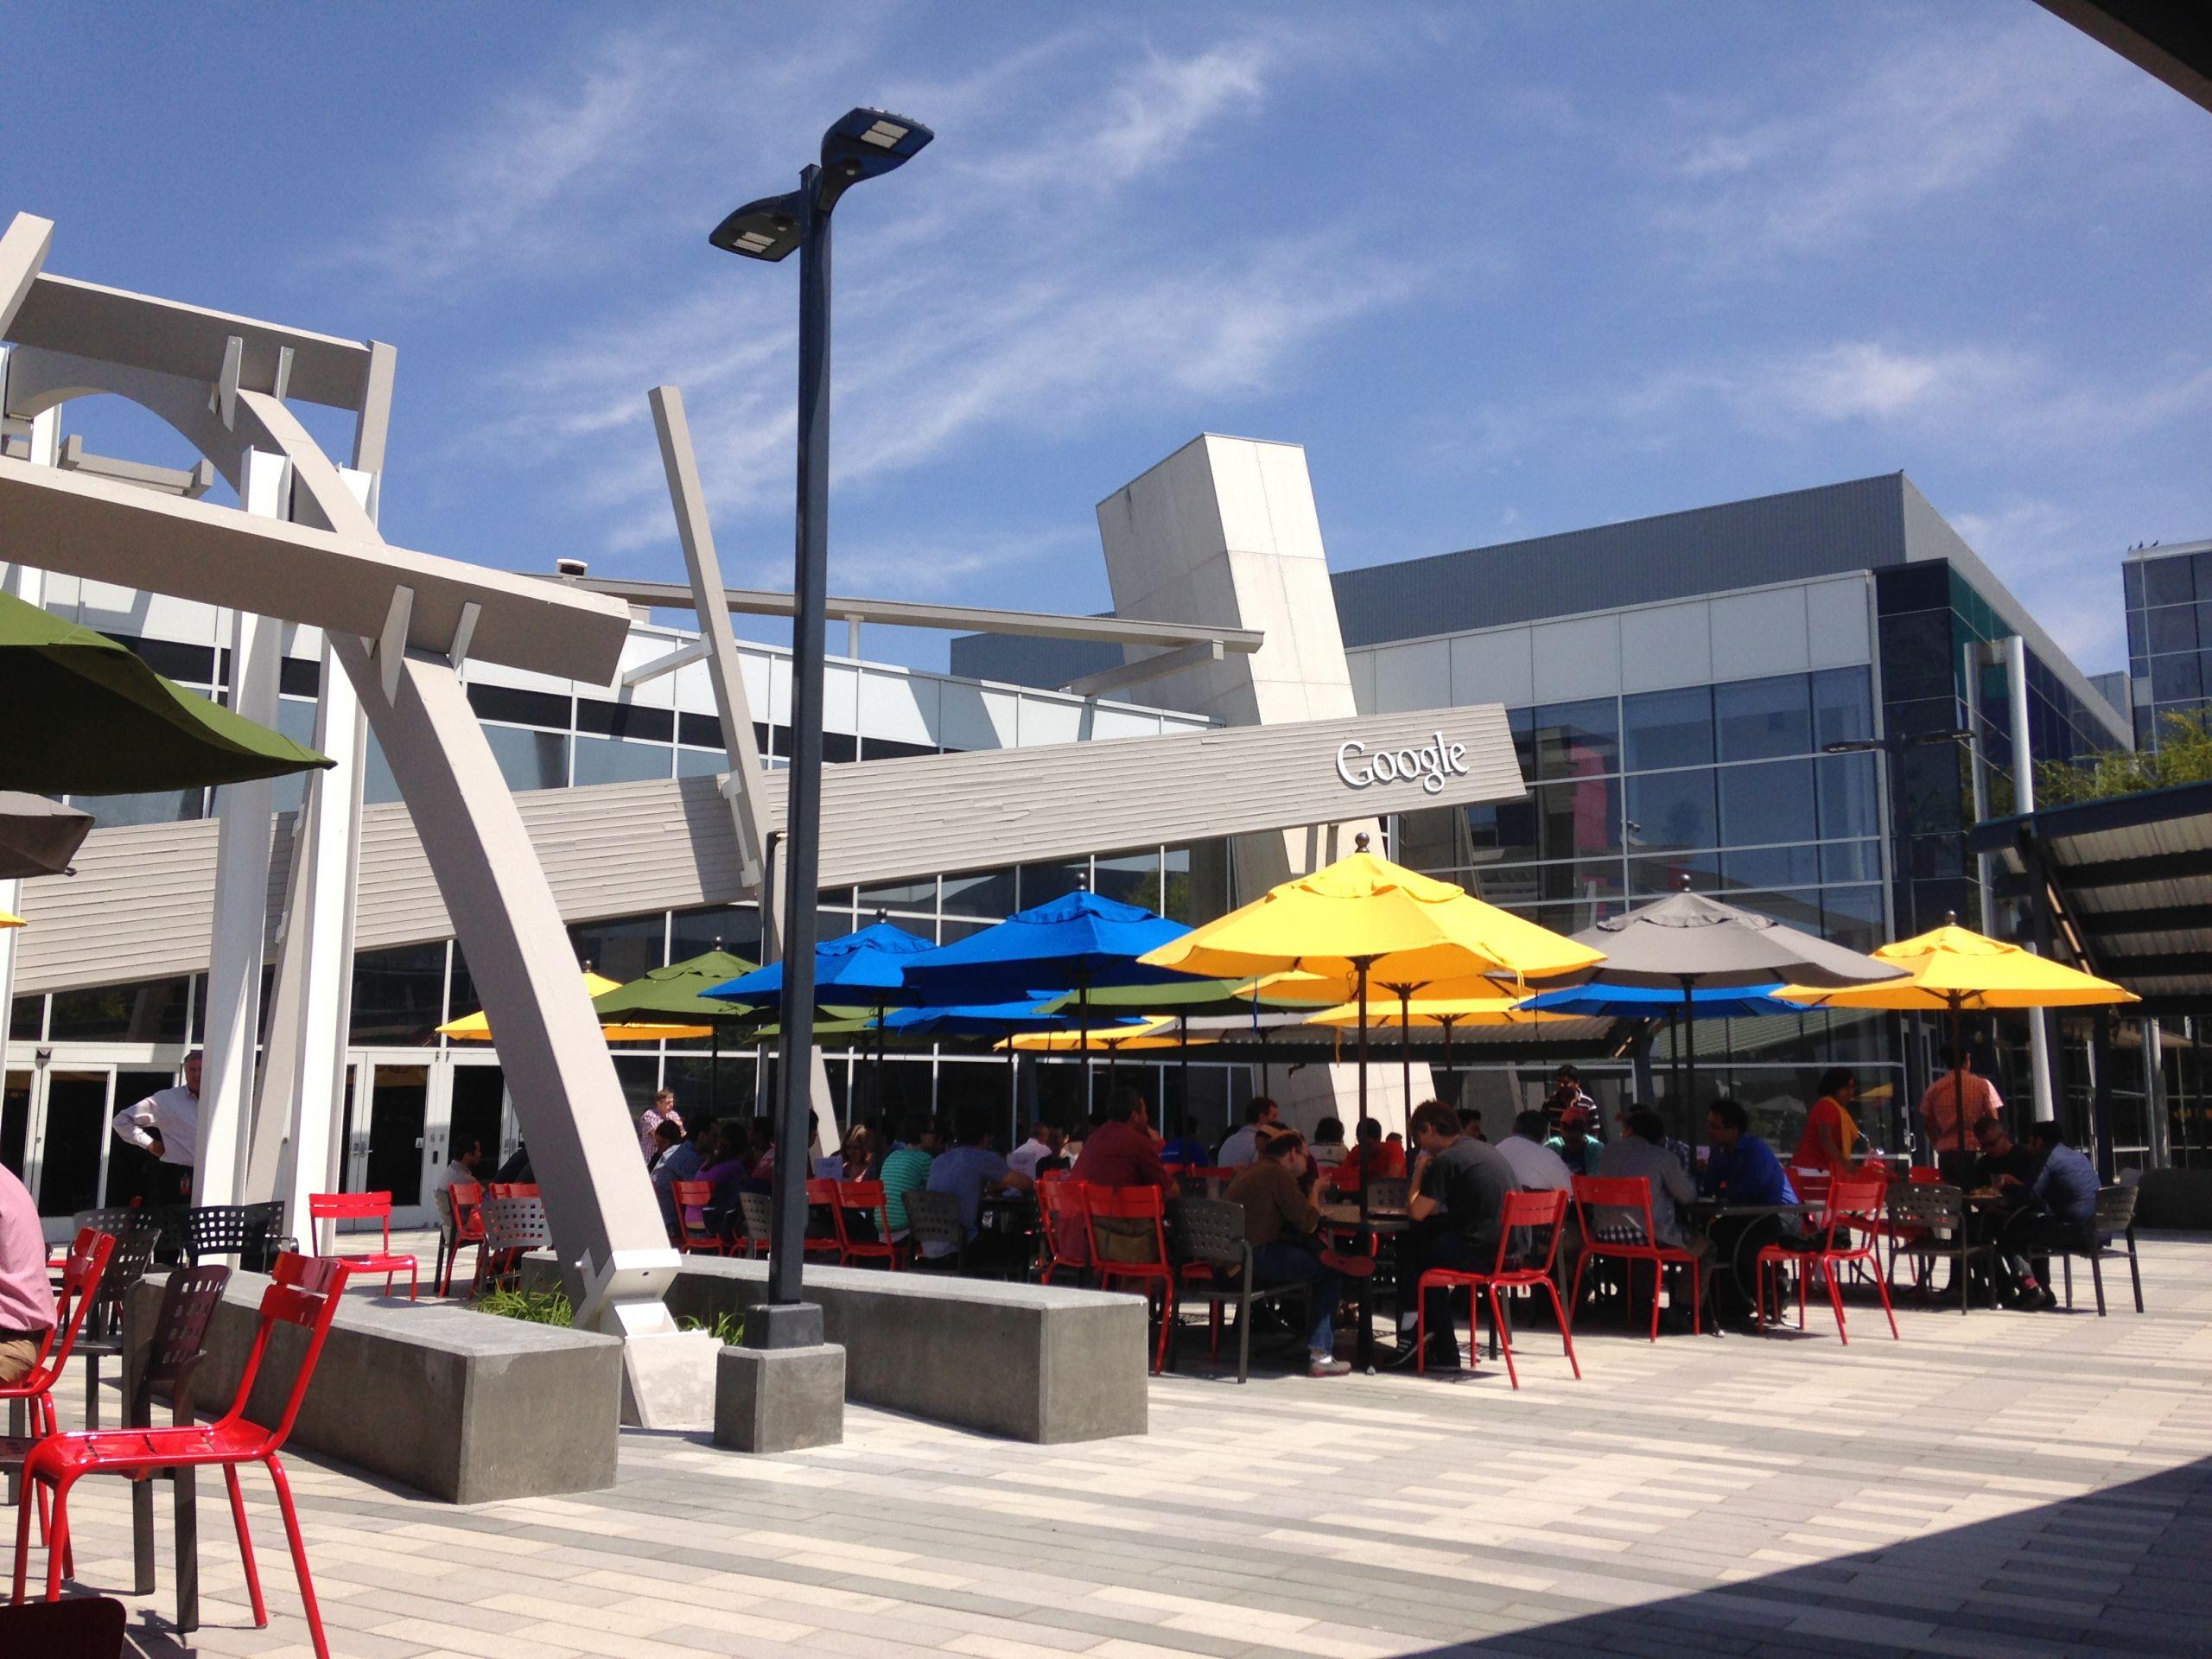 Googleplex Patio Aug 2014 JPG